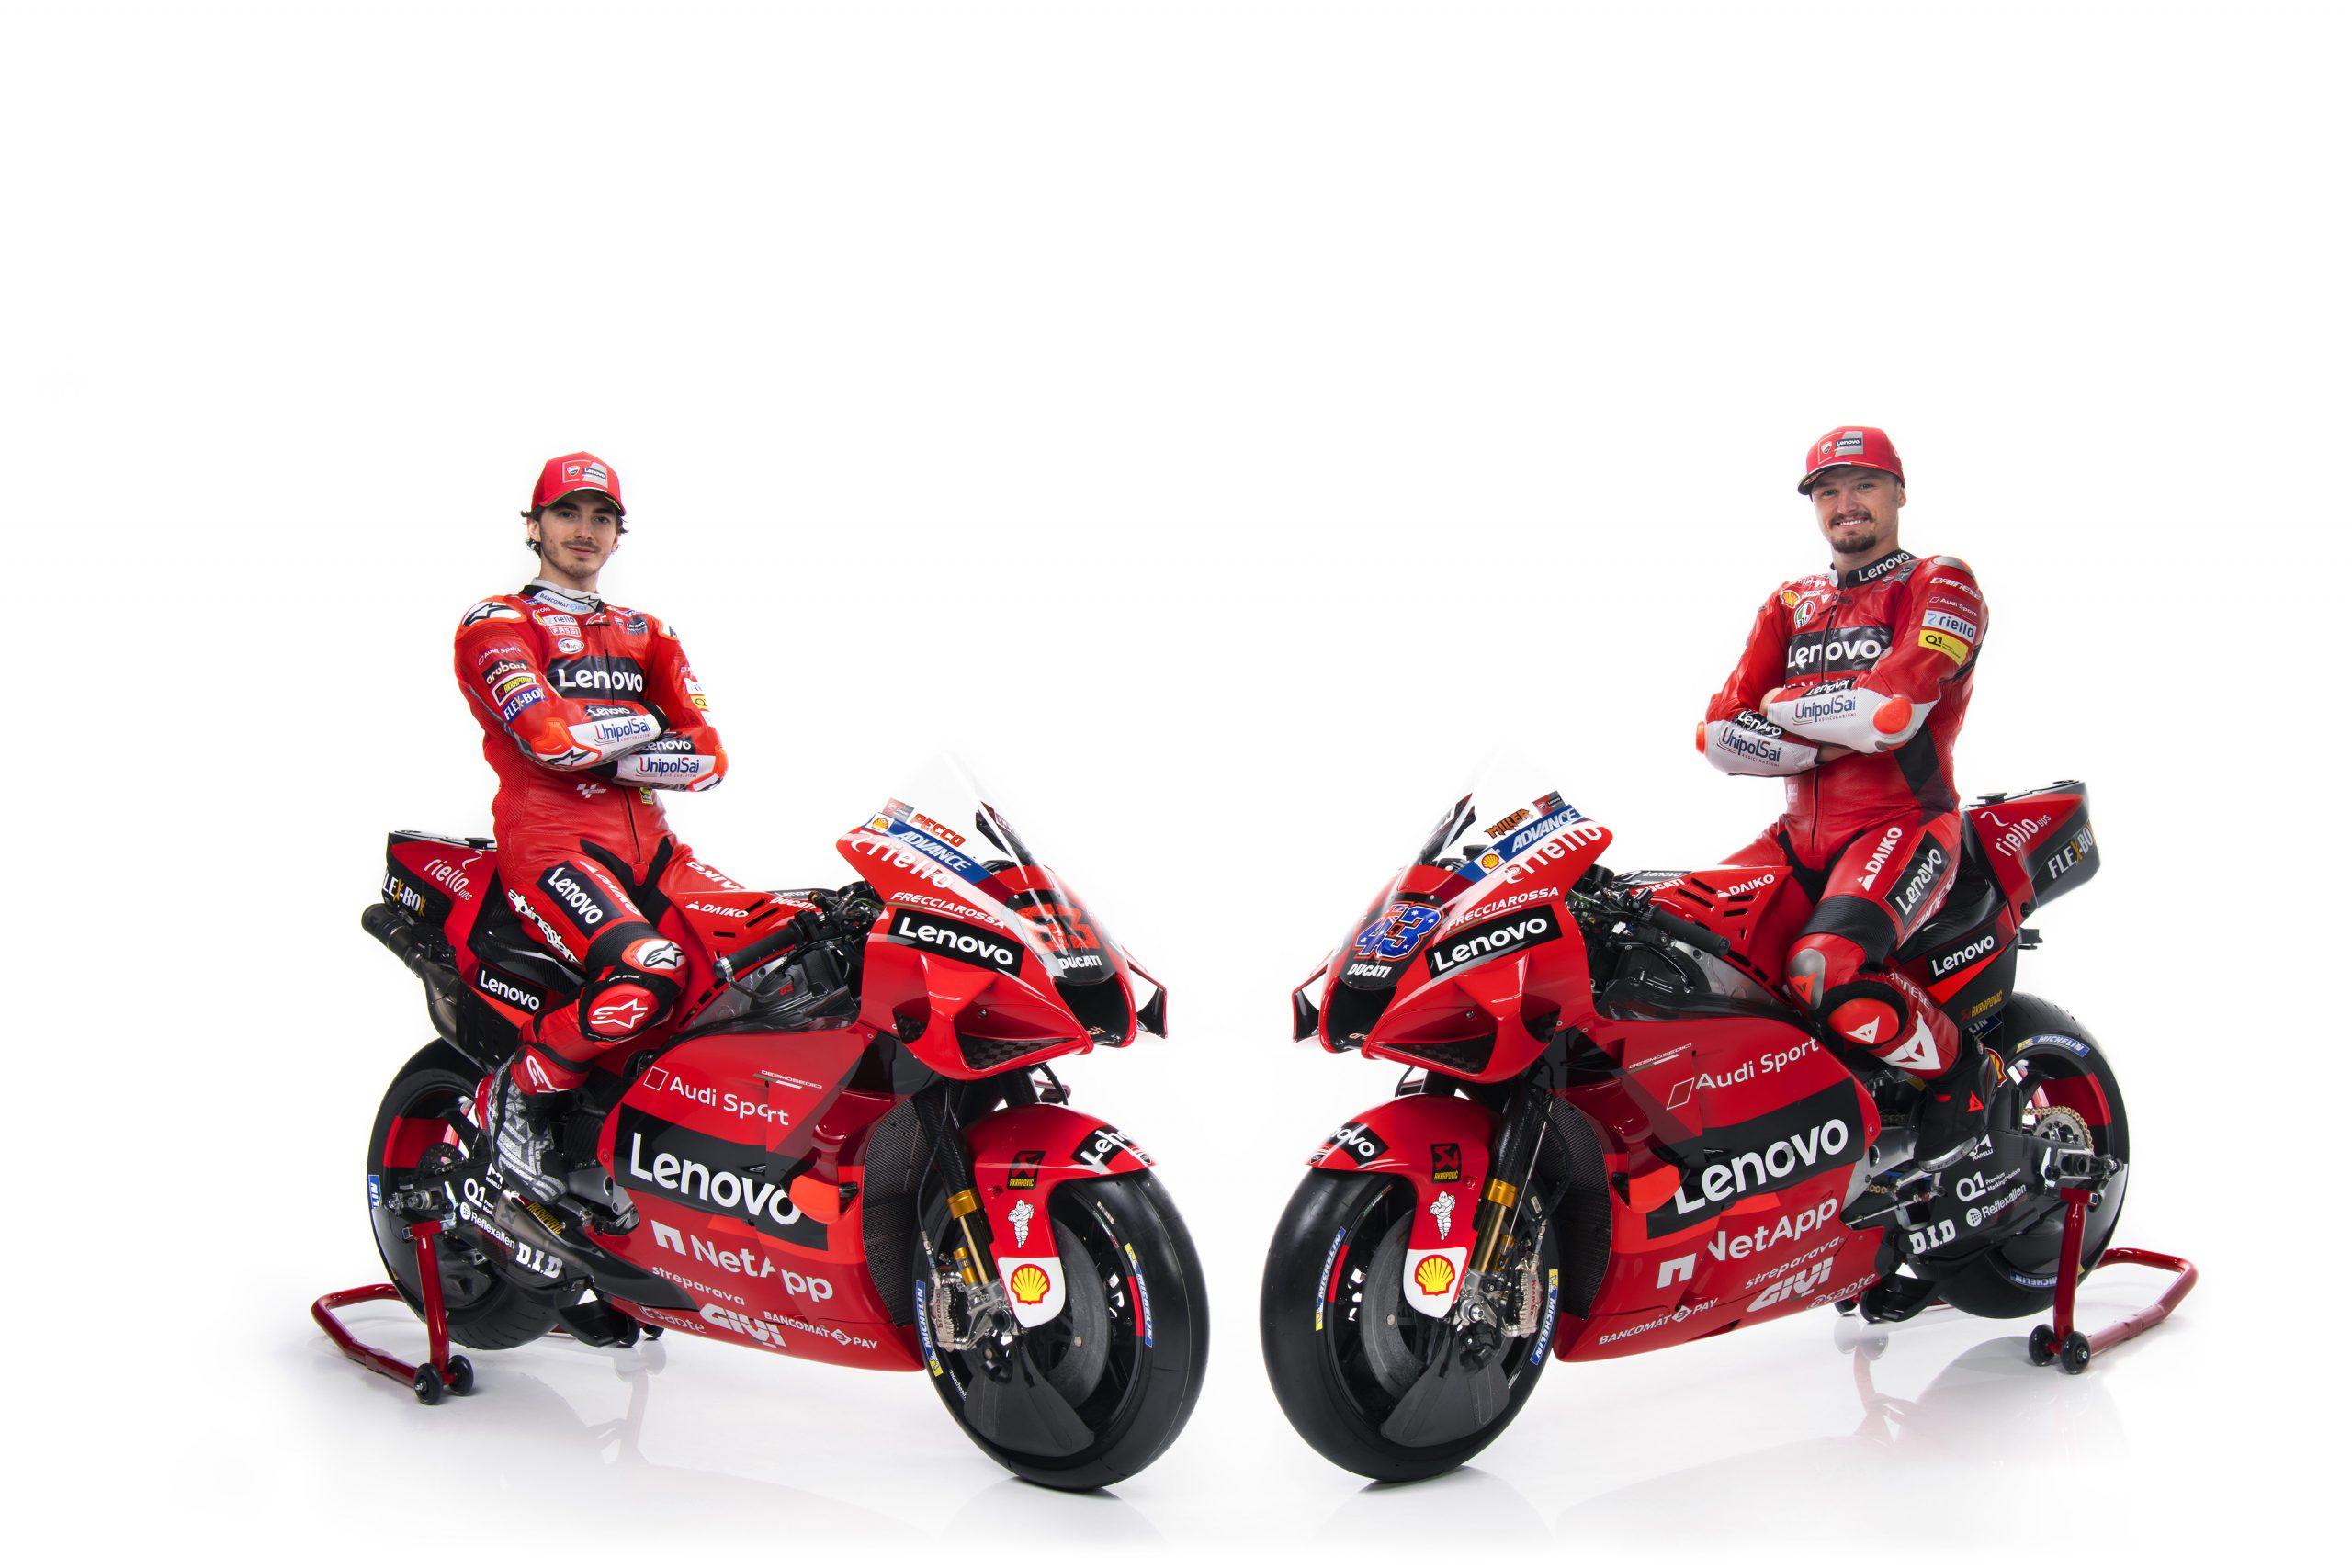 Pecco Bagnaia i Jack Miller podczas prezentacji Ducati Lenovo Team na sezon 2021 MotoGP